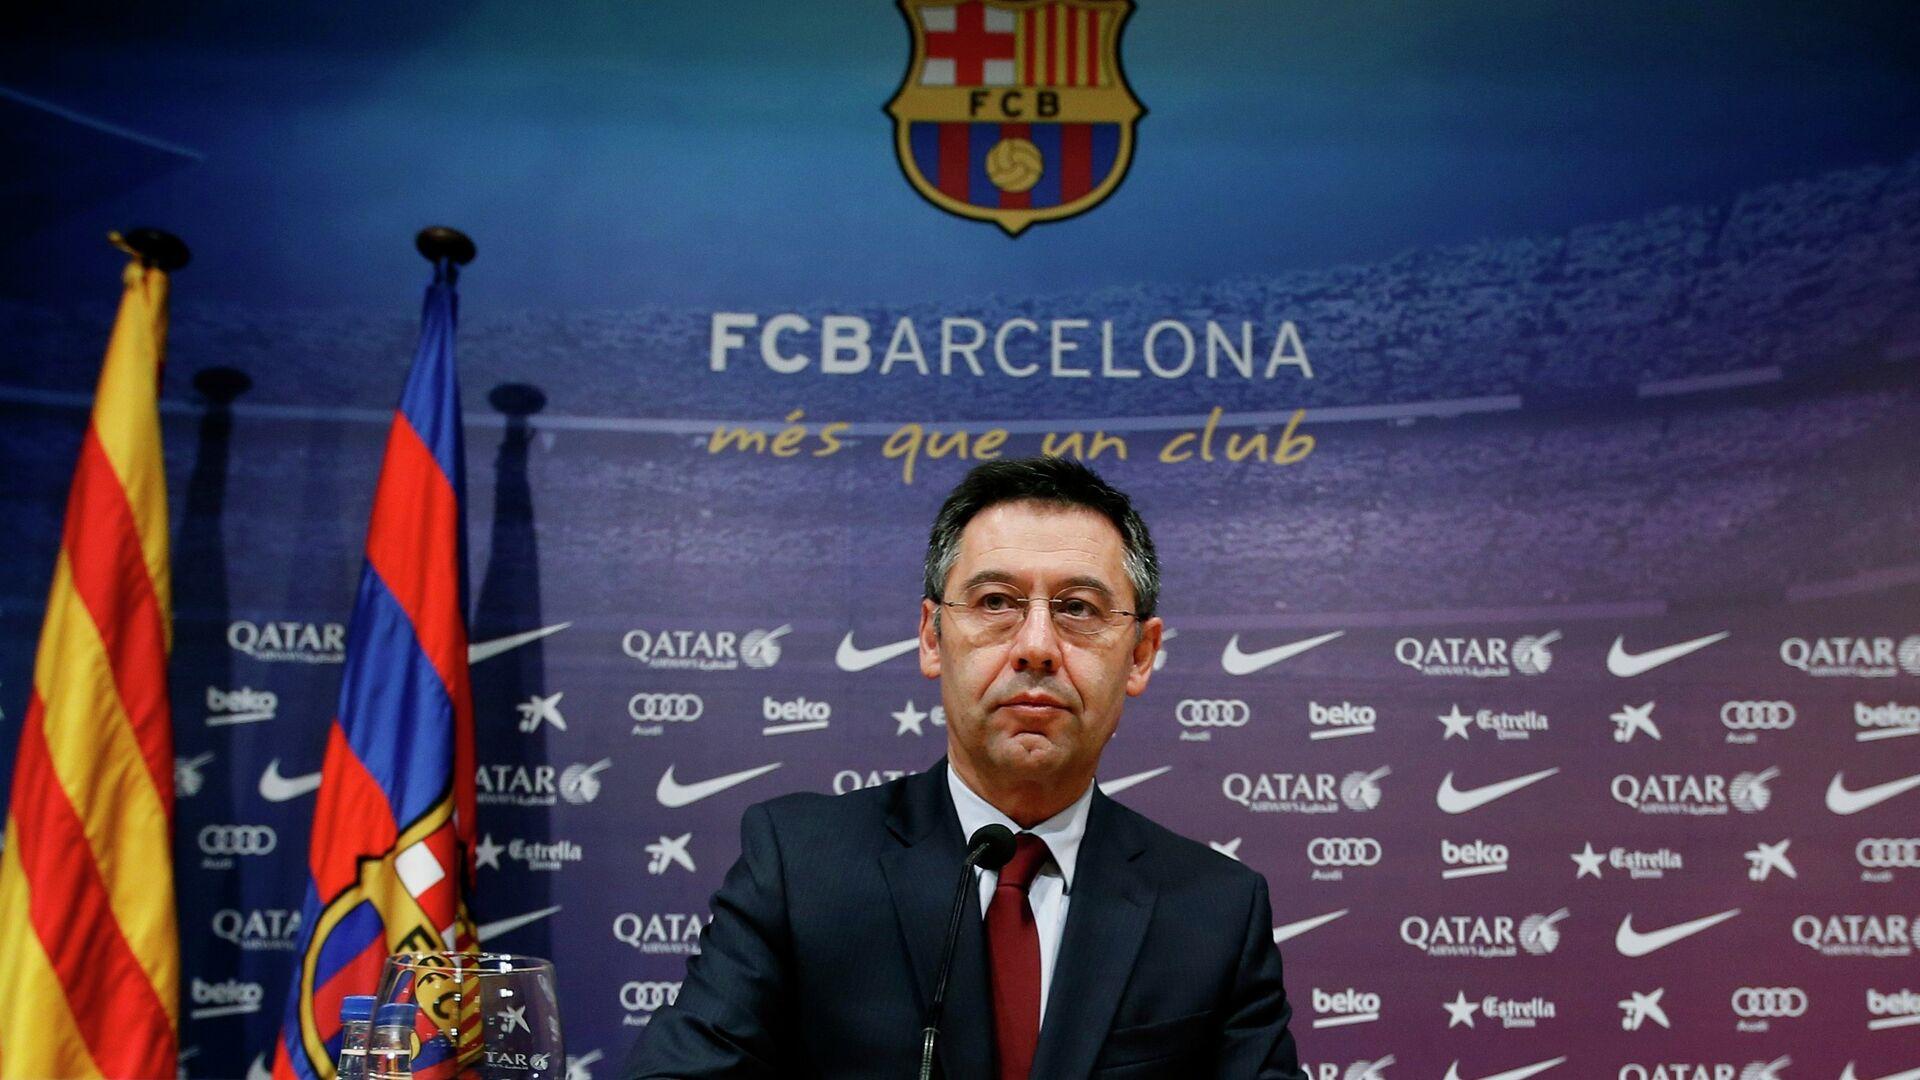 Josep Maria Bartomeu el expresidente del FC Barcelona  - Sputnik Mundo, 1920, 01.03.2021